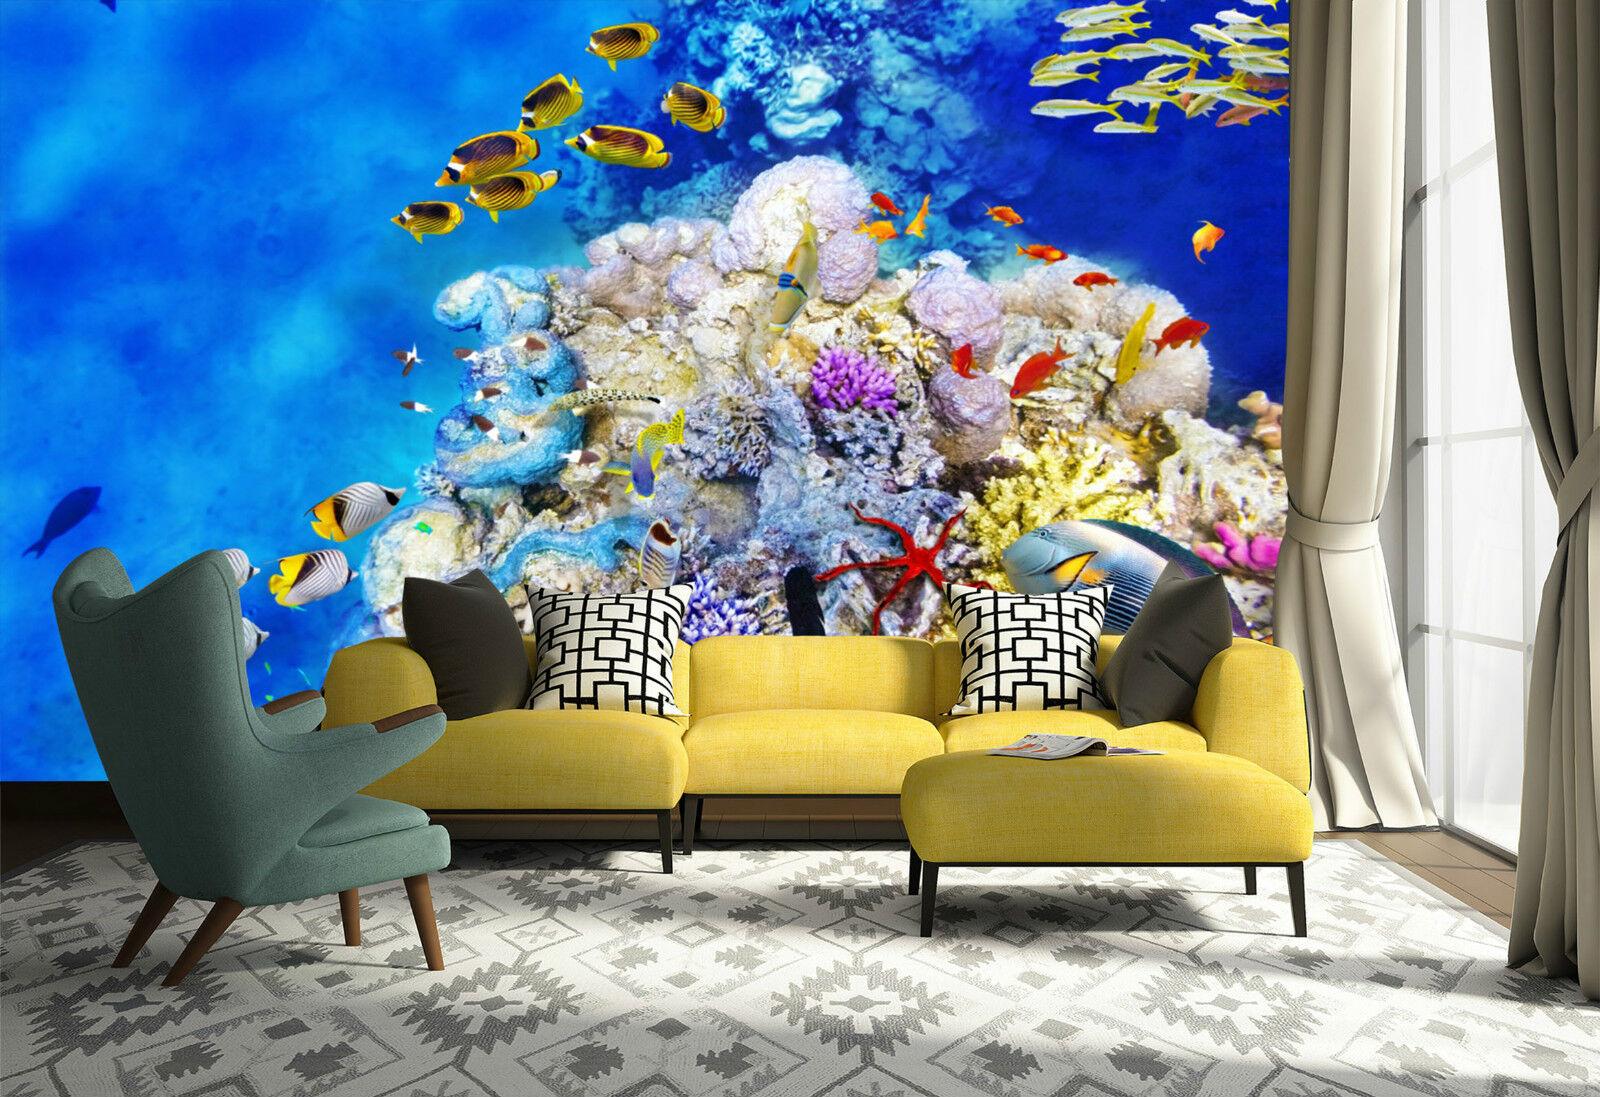 3D Angeln 6455 Fototapeten Wandbild Fototapete Bild Tapete Familie Kinder DE